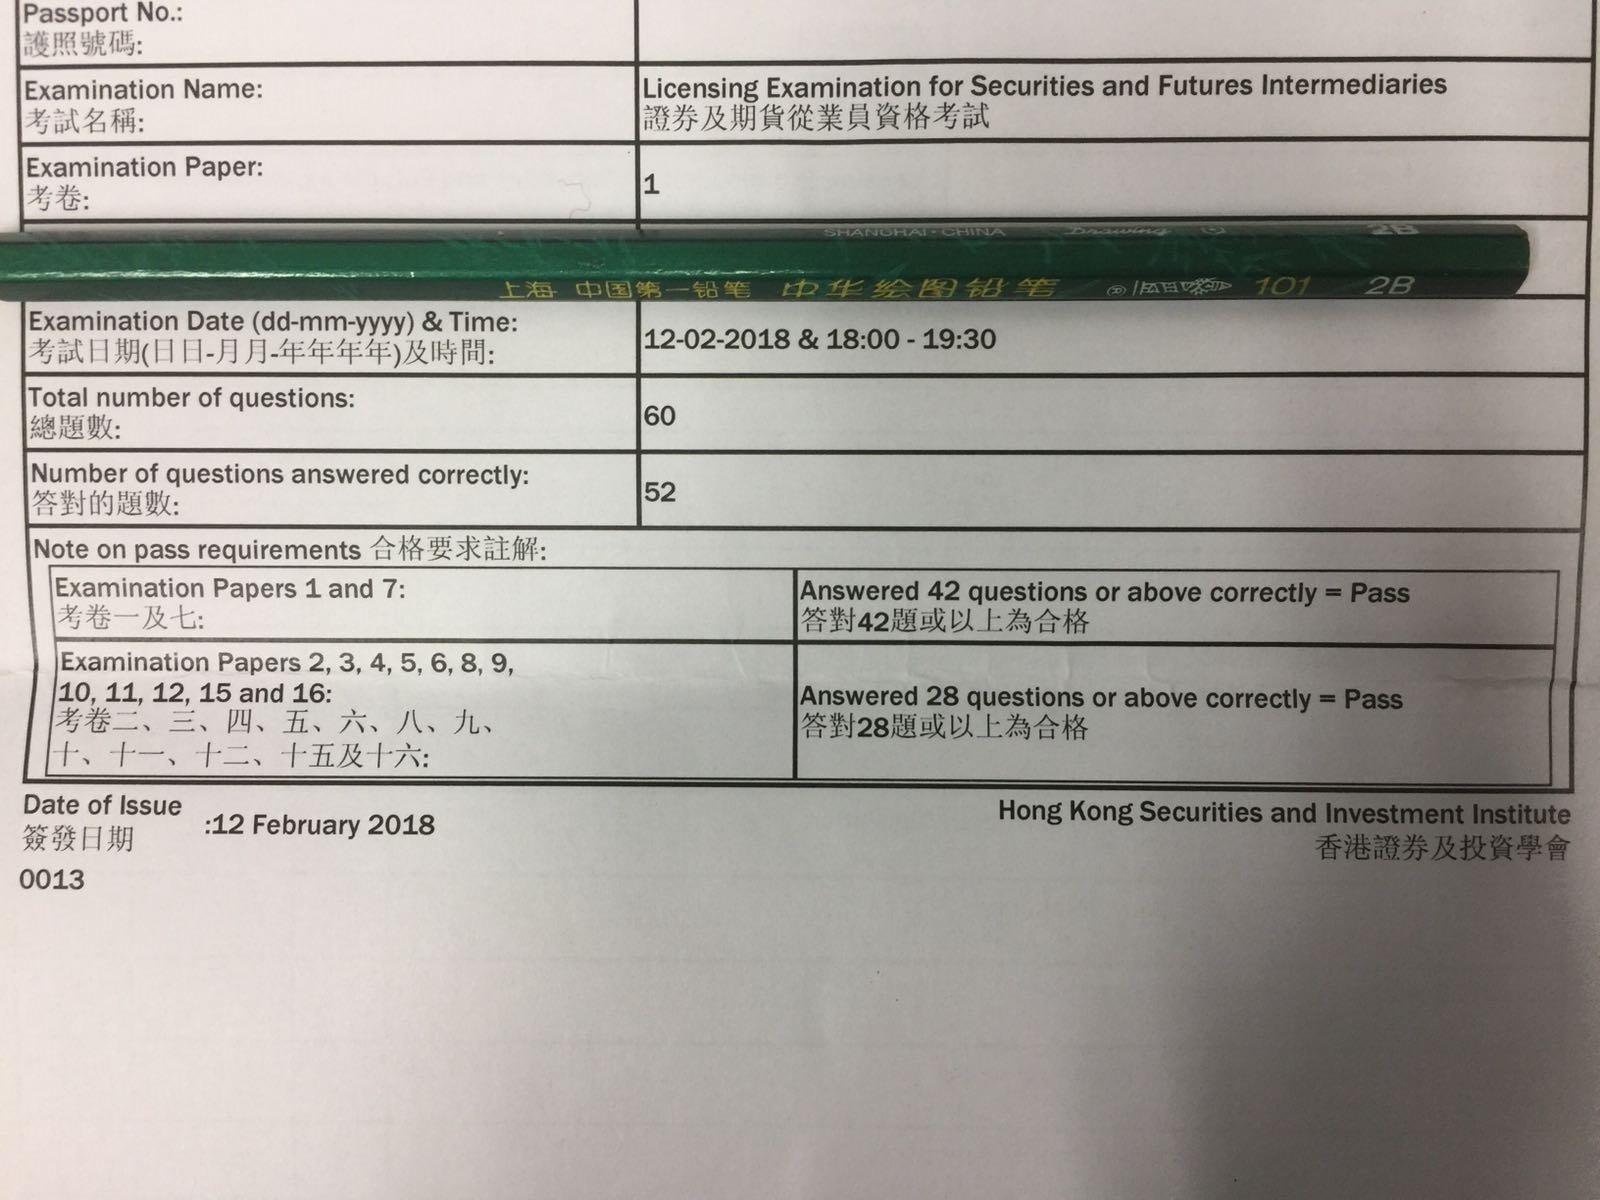 GY 12/2/2018 LE Paper 1 證券期貨從業員資格考試卷一 Pass